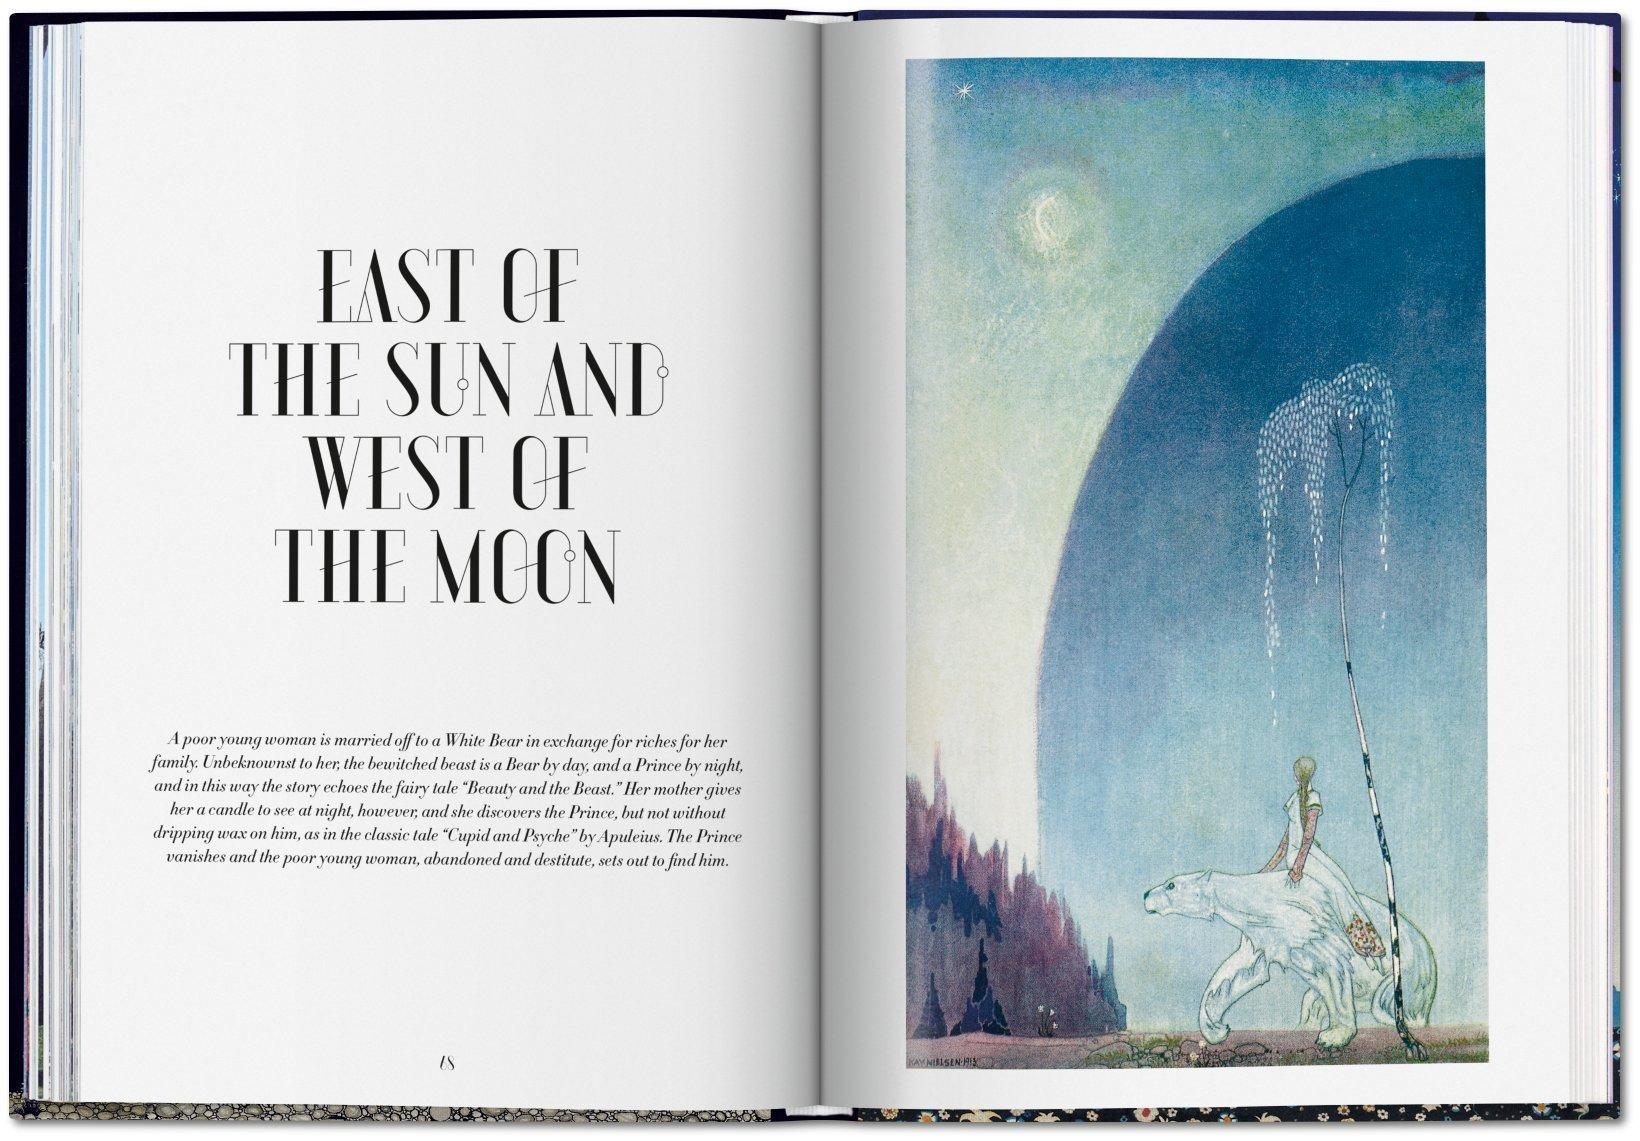 sun and moon stood still craft ebook